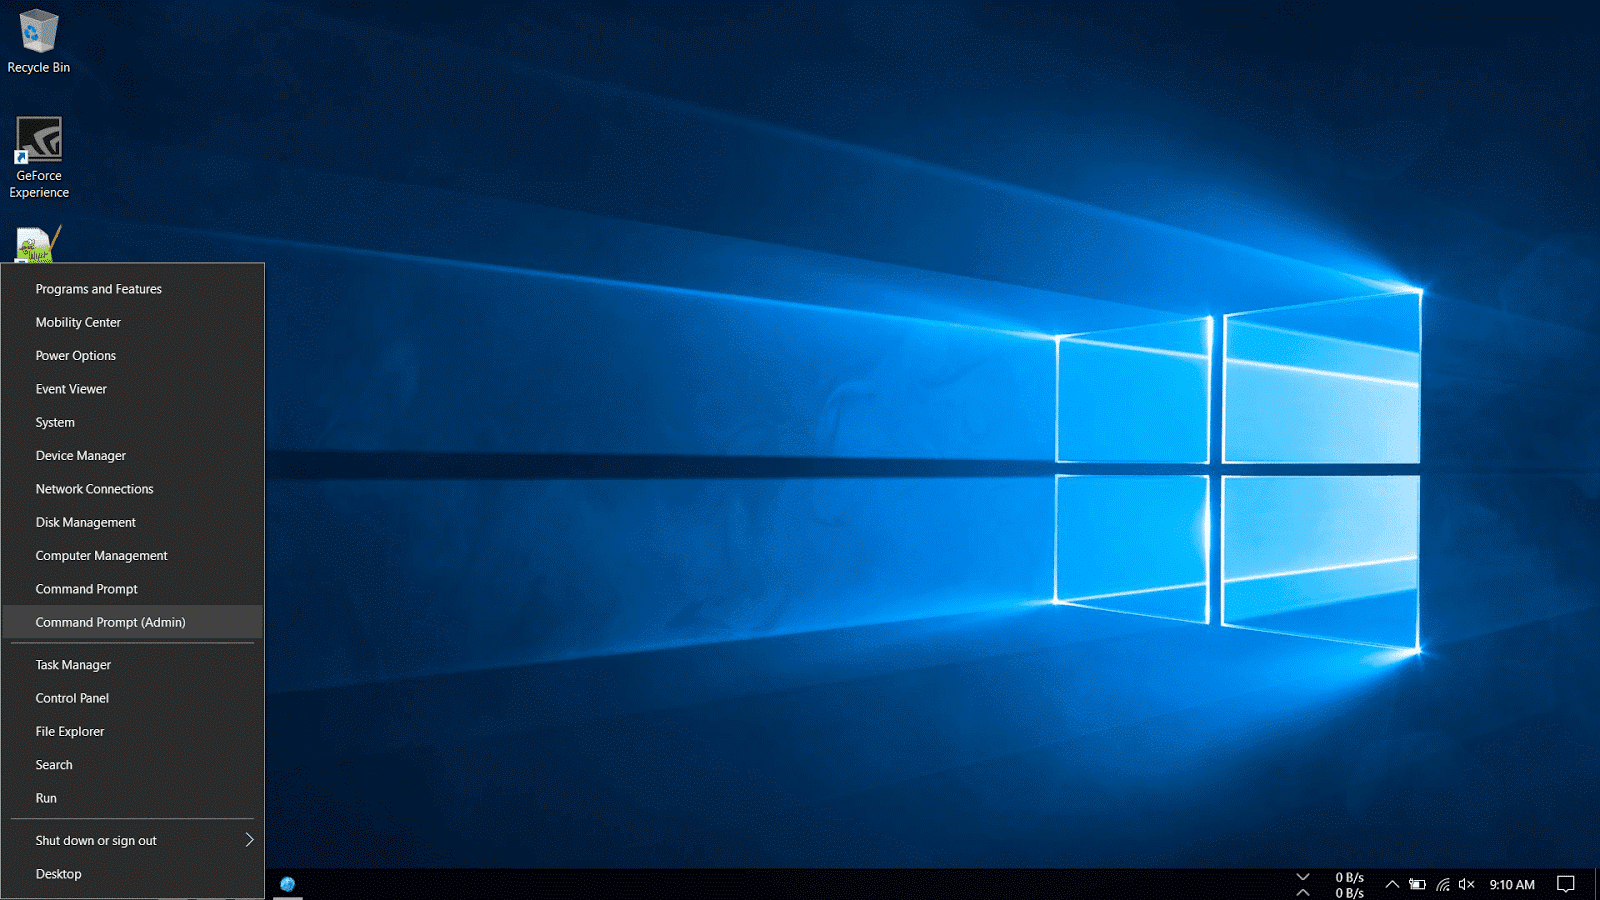 Install updates on Windows 10